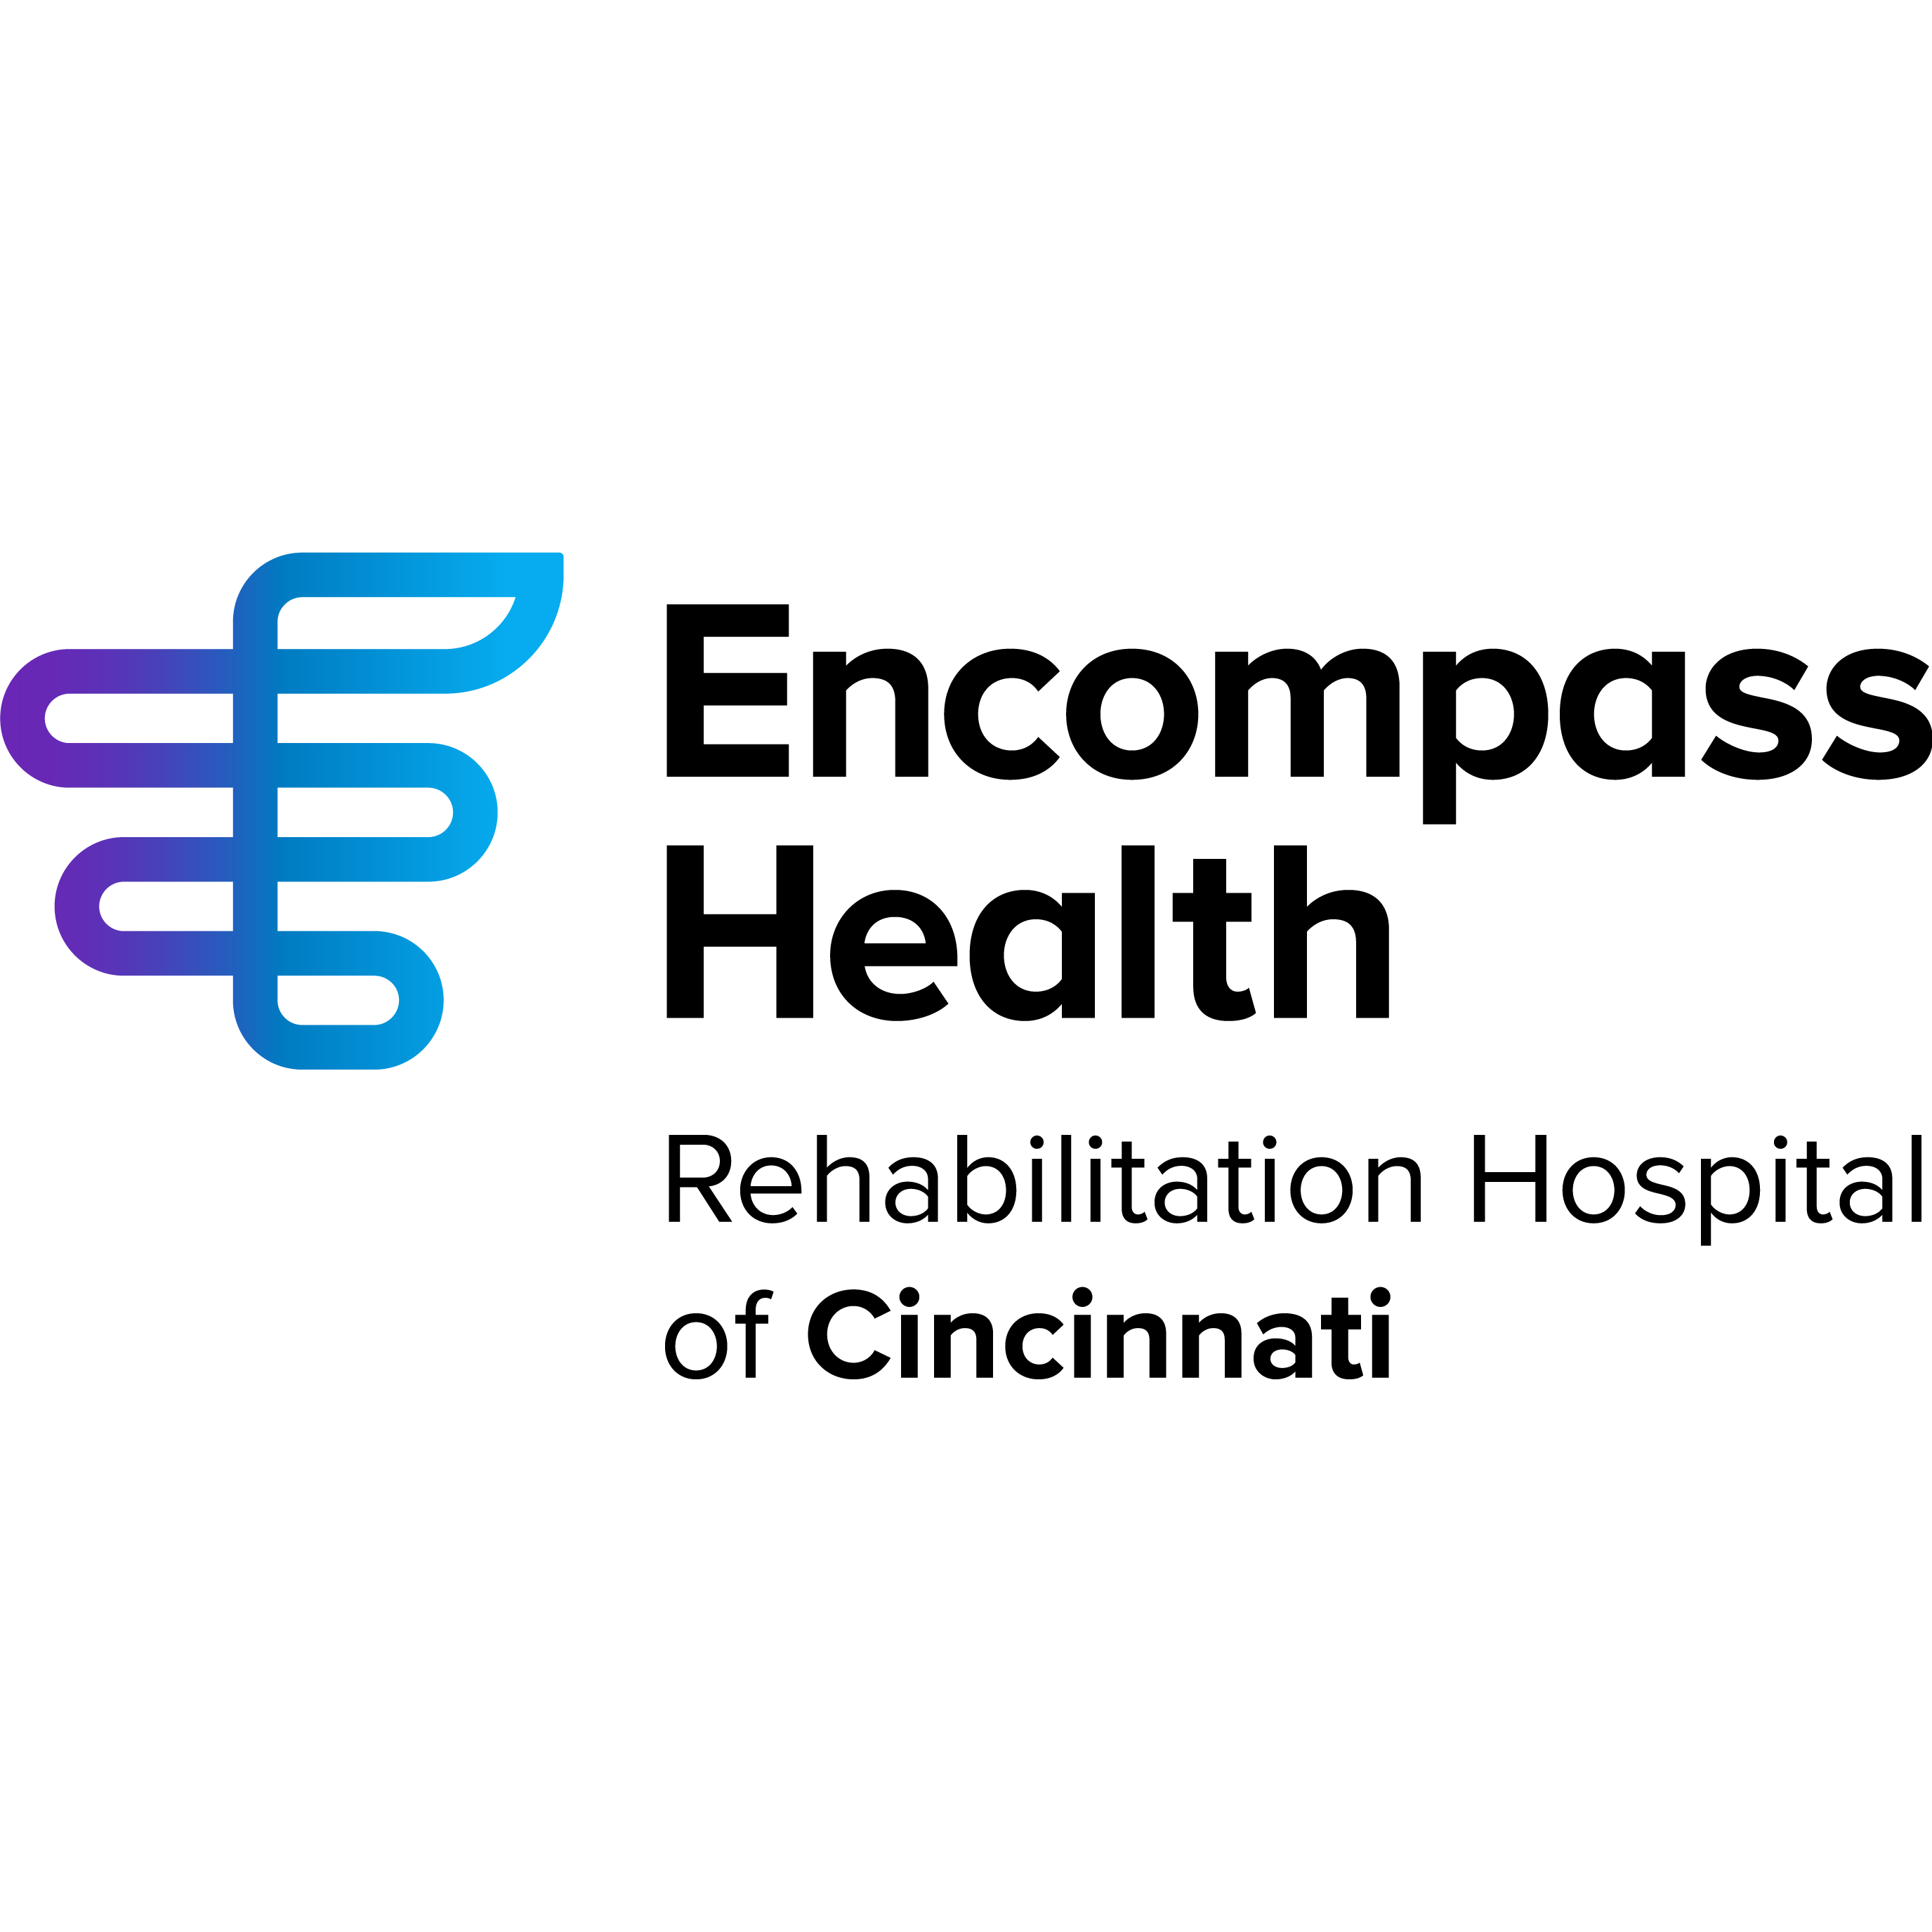 Encompass Health Rehabilitation Hospital of Cincinnati image 1